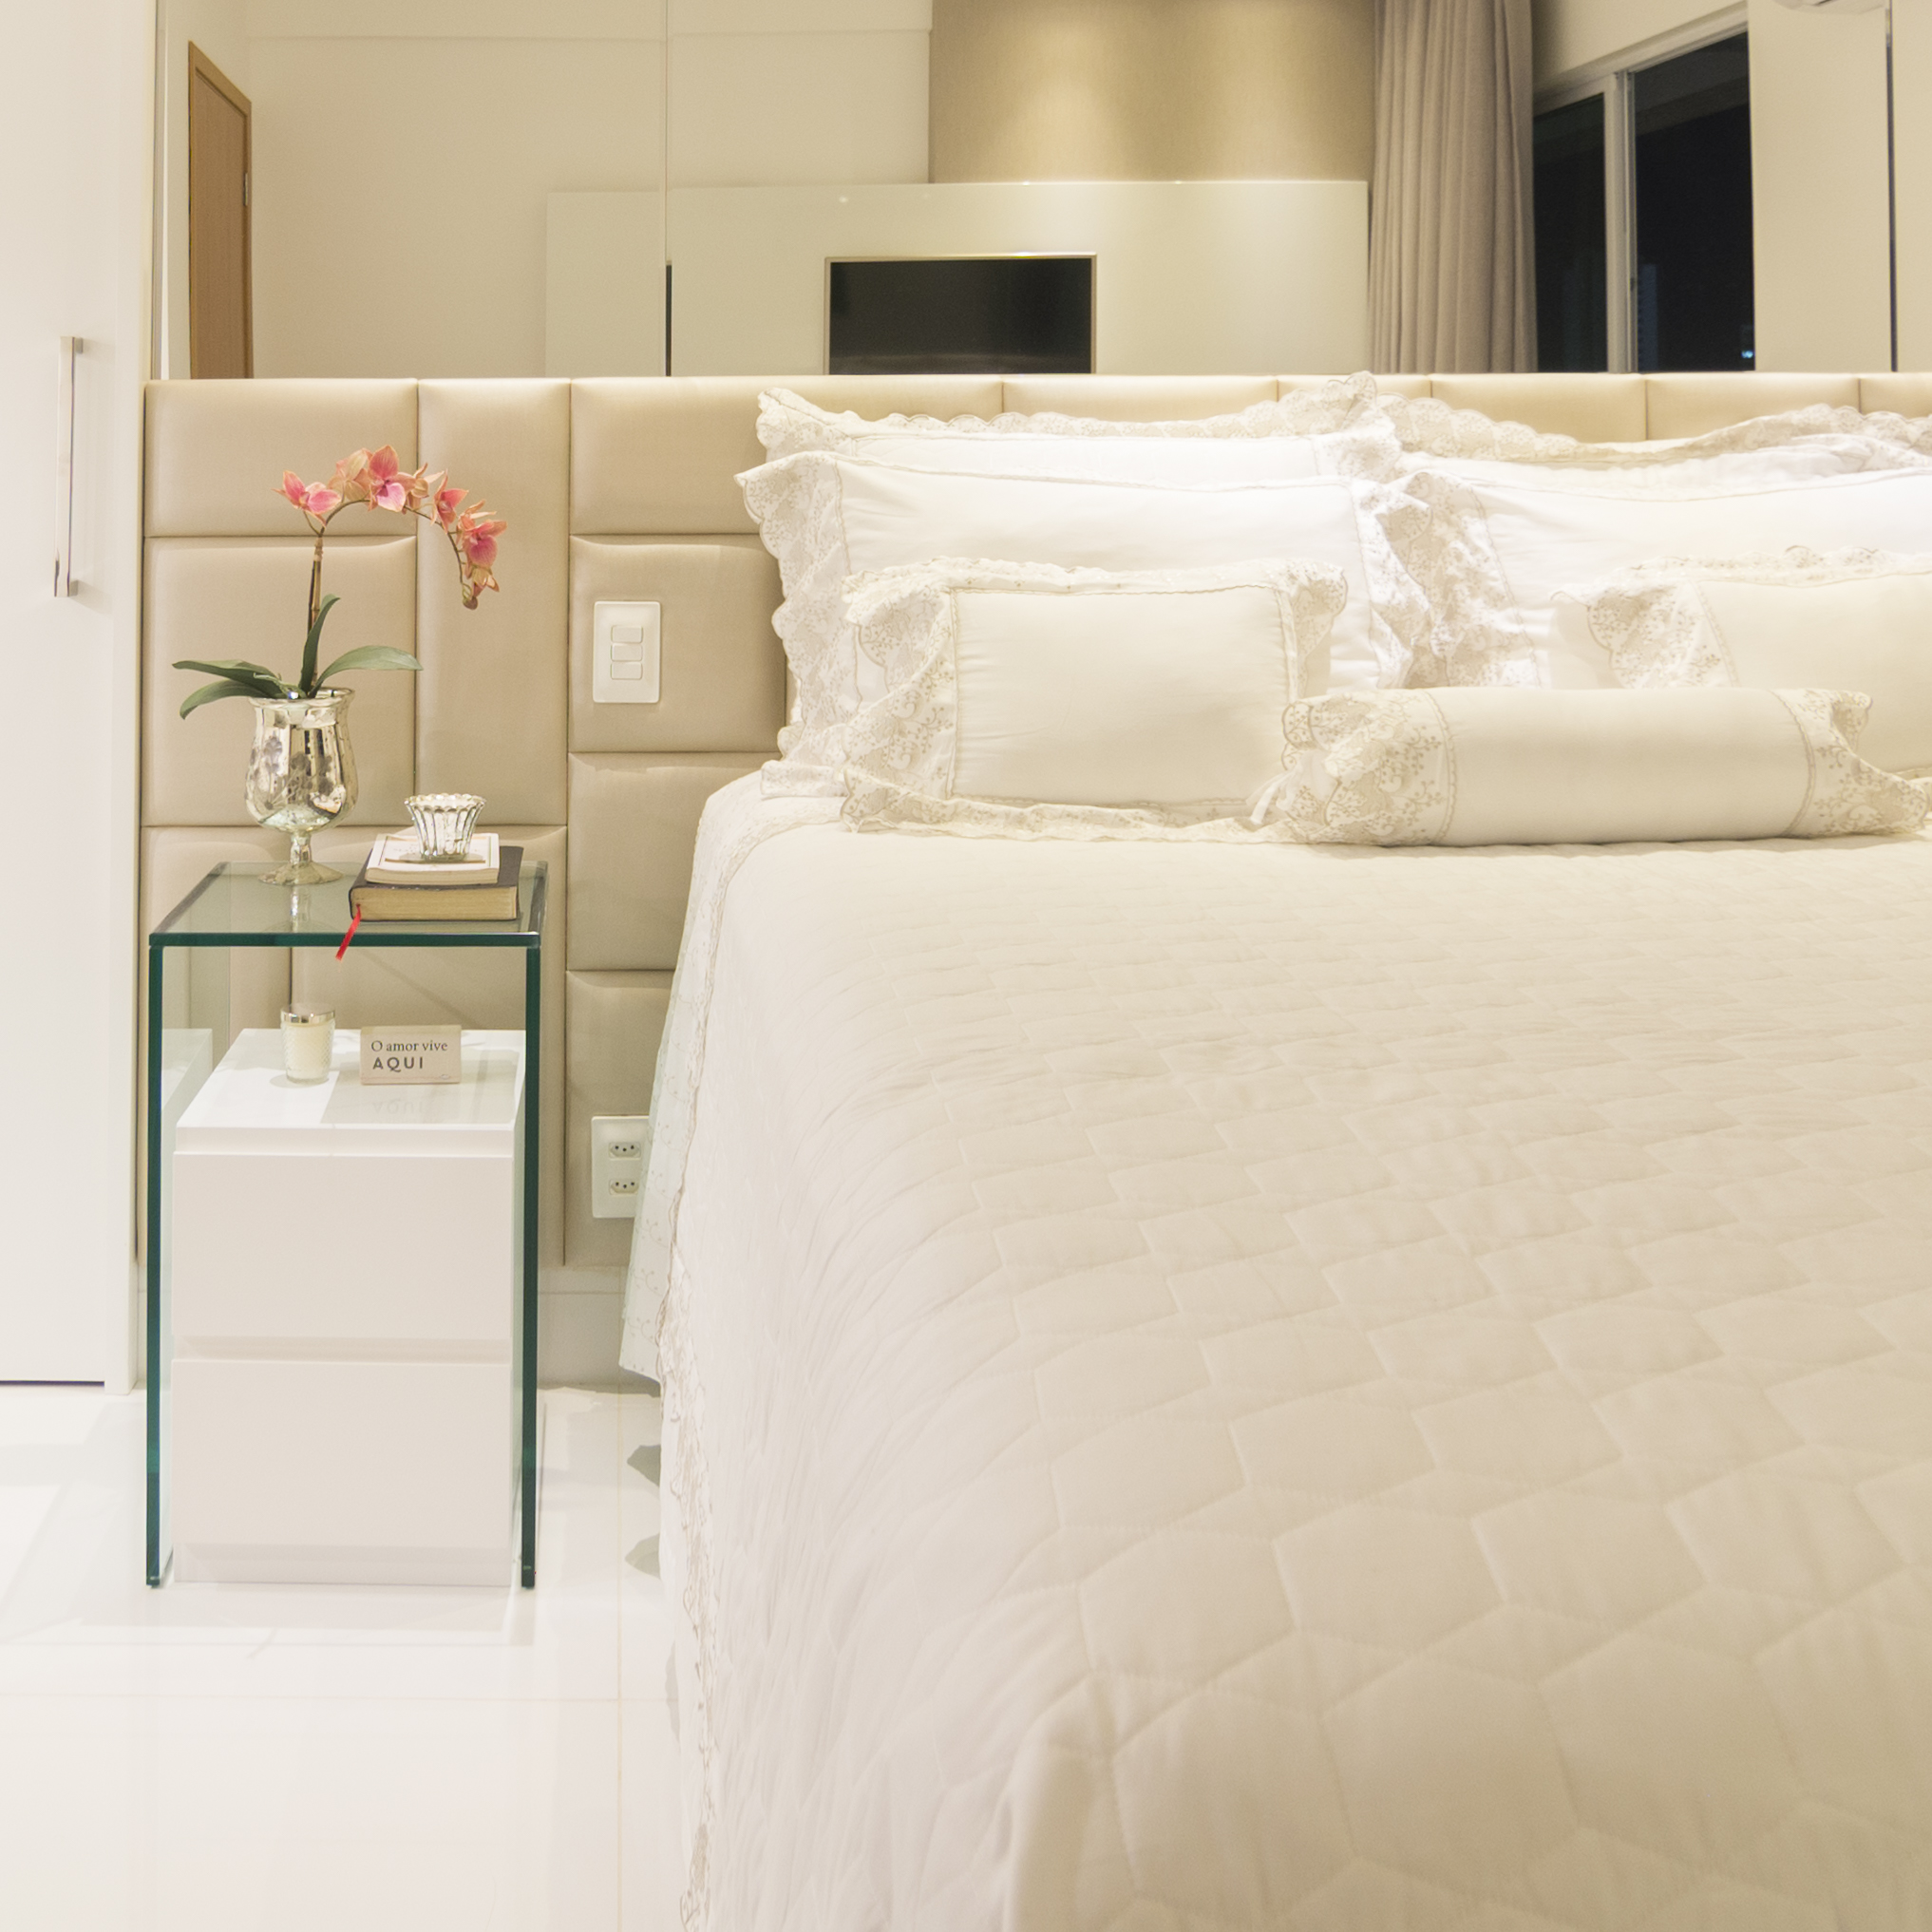 projeto-arquitetonico-robertoindira-duo-arquitetura-apartamentos-quarto-02.jpg